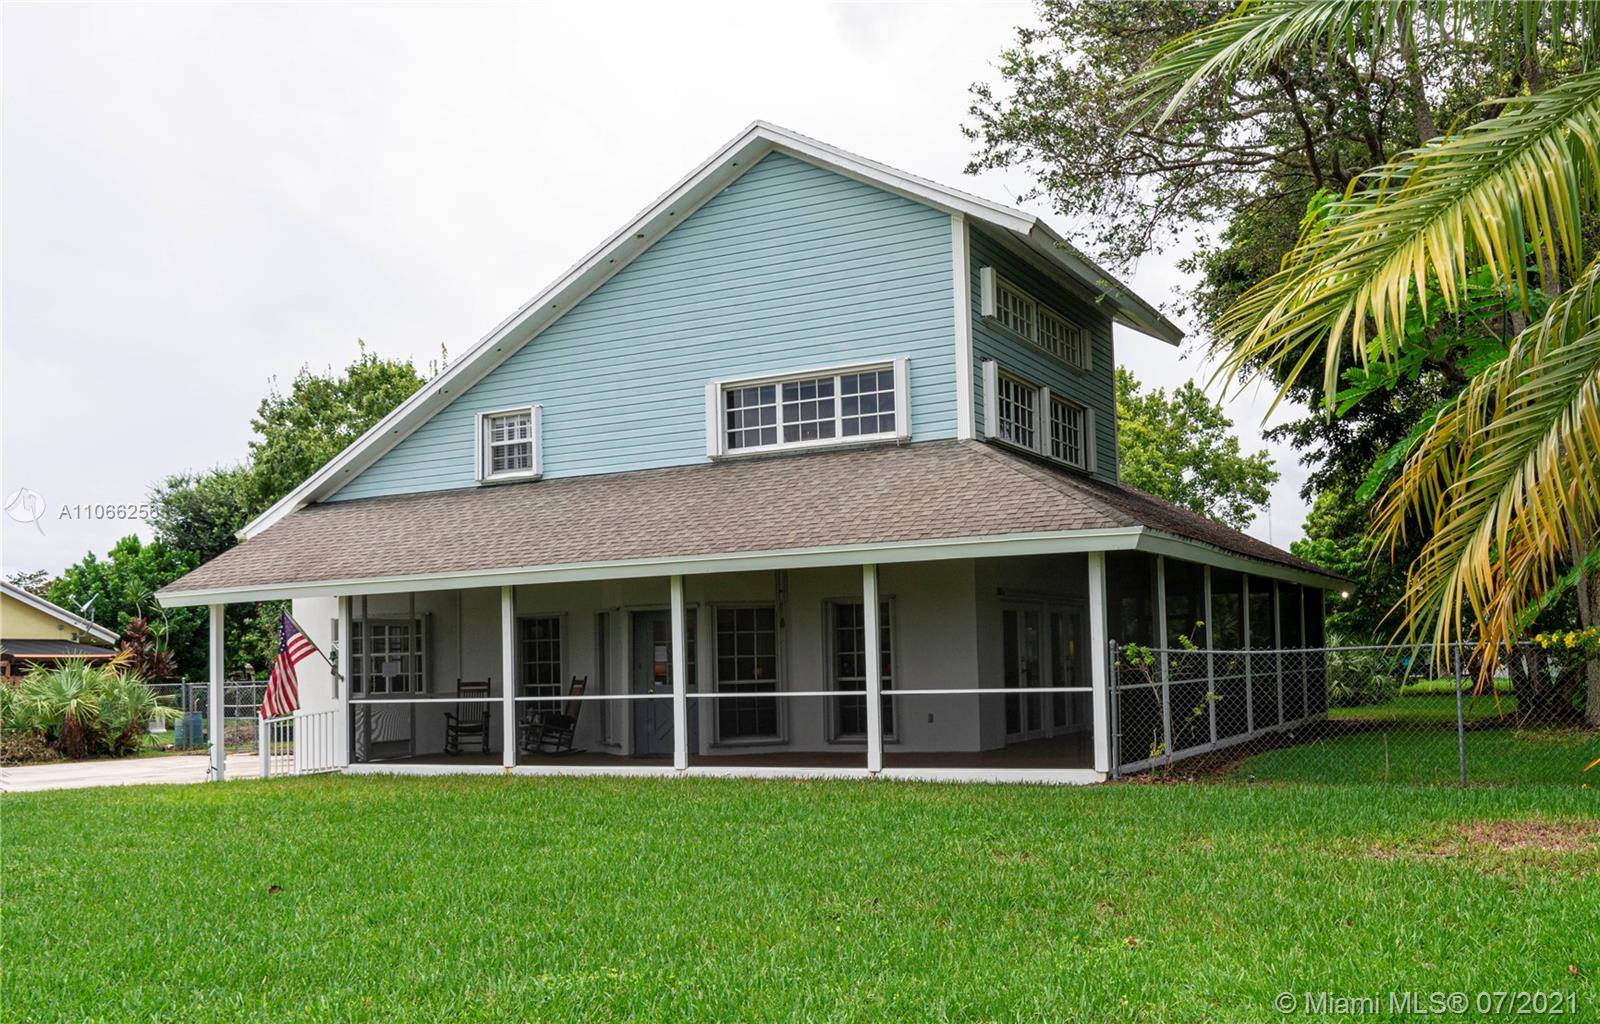 16721 Sw 278th St Property Photo 1